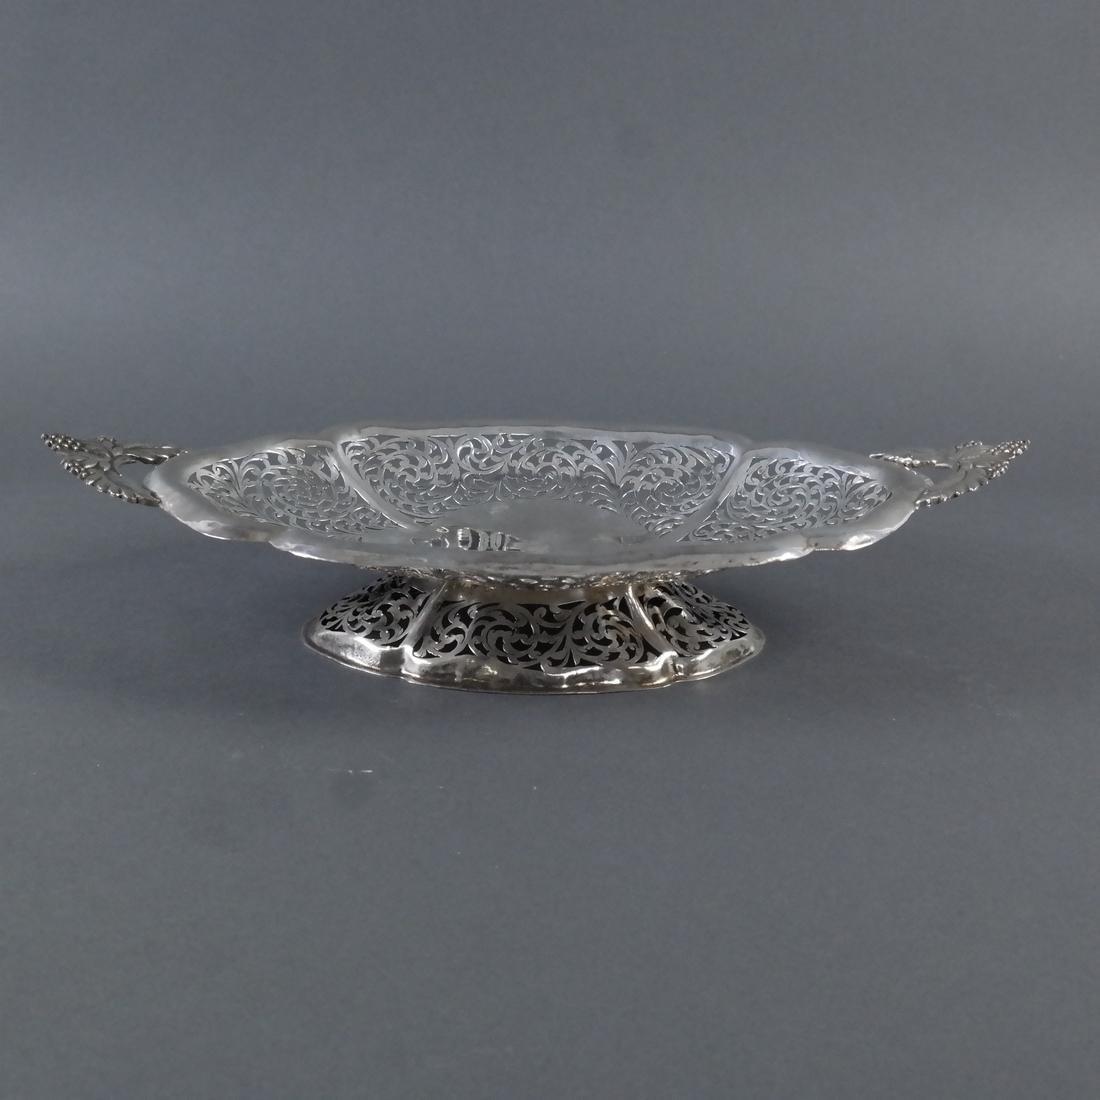 .900 Standard Silver Pierced Compote